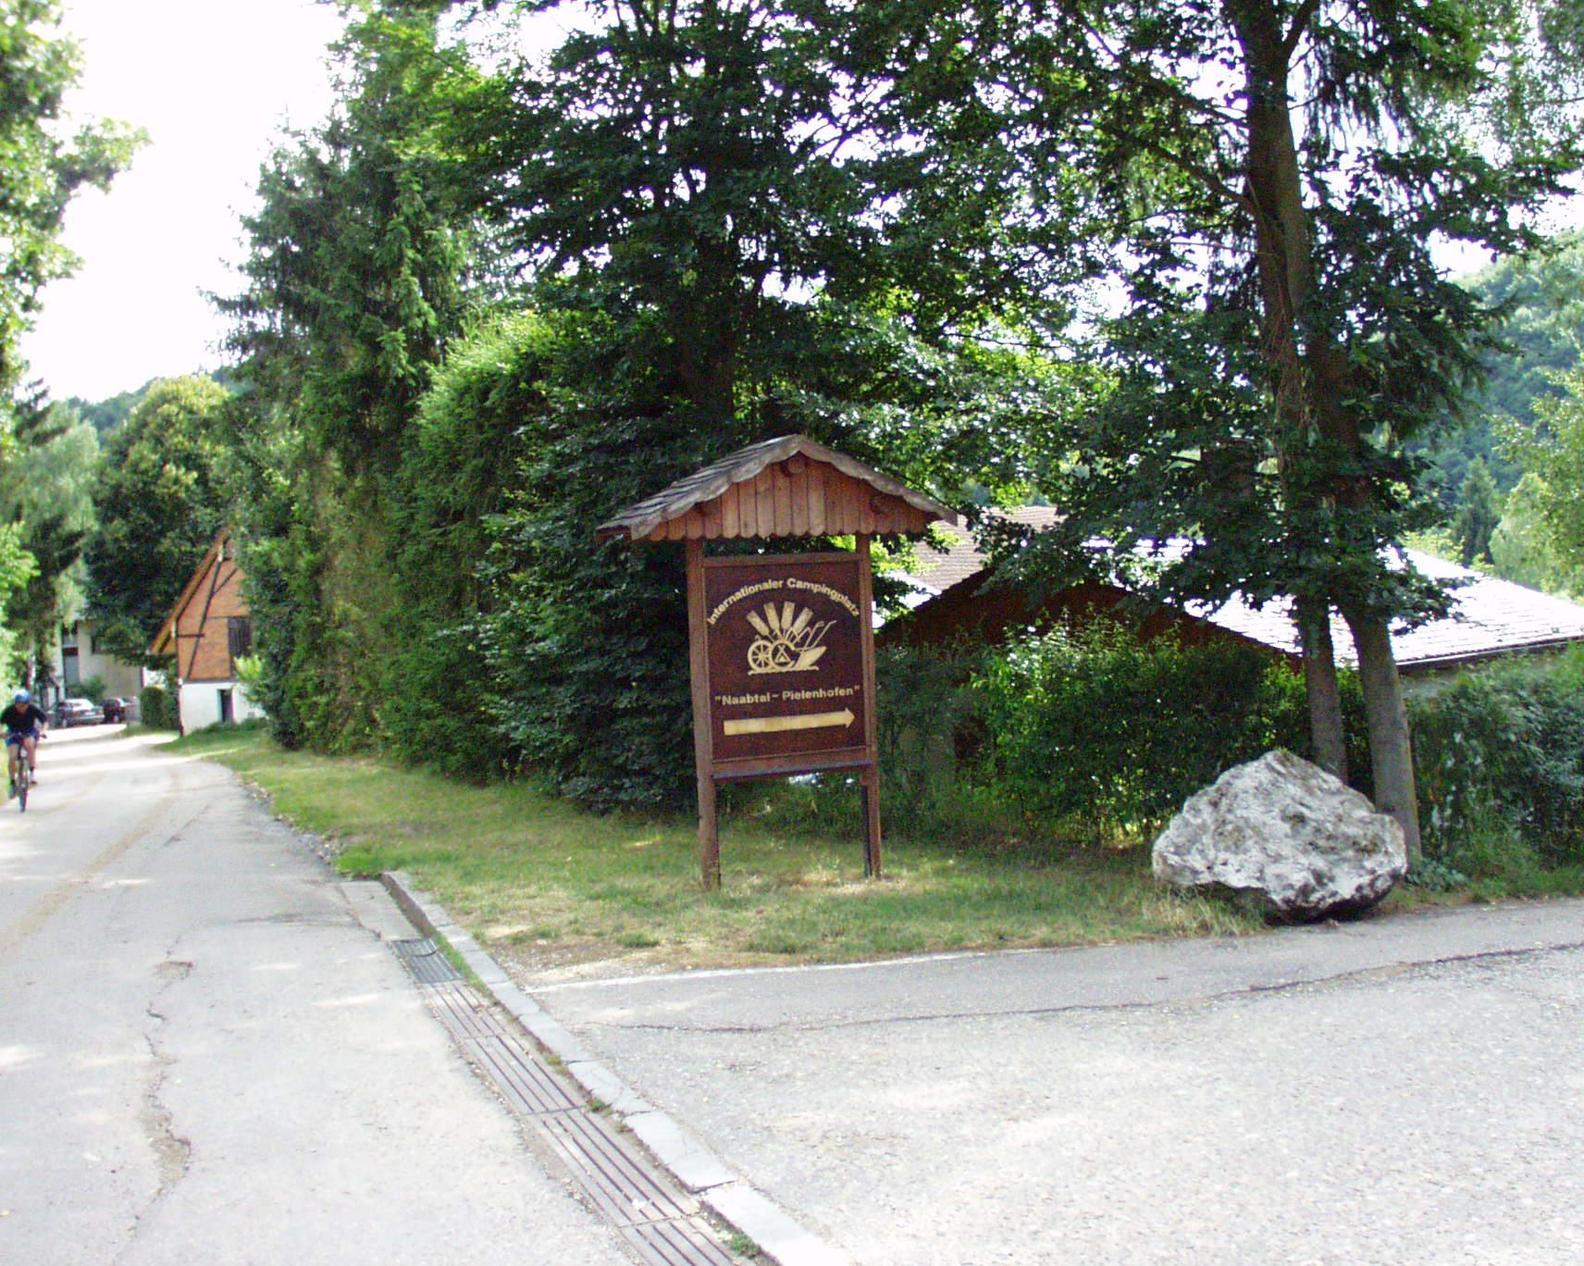 Duitsland-Pielenhofen-Campingplatz%20Naabtal-ExtraLarge Campings Duitsland